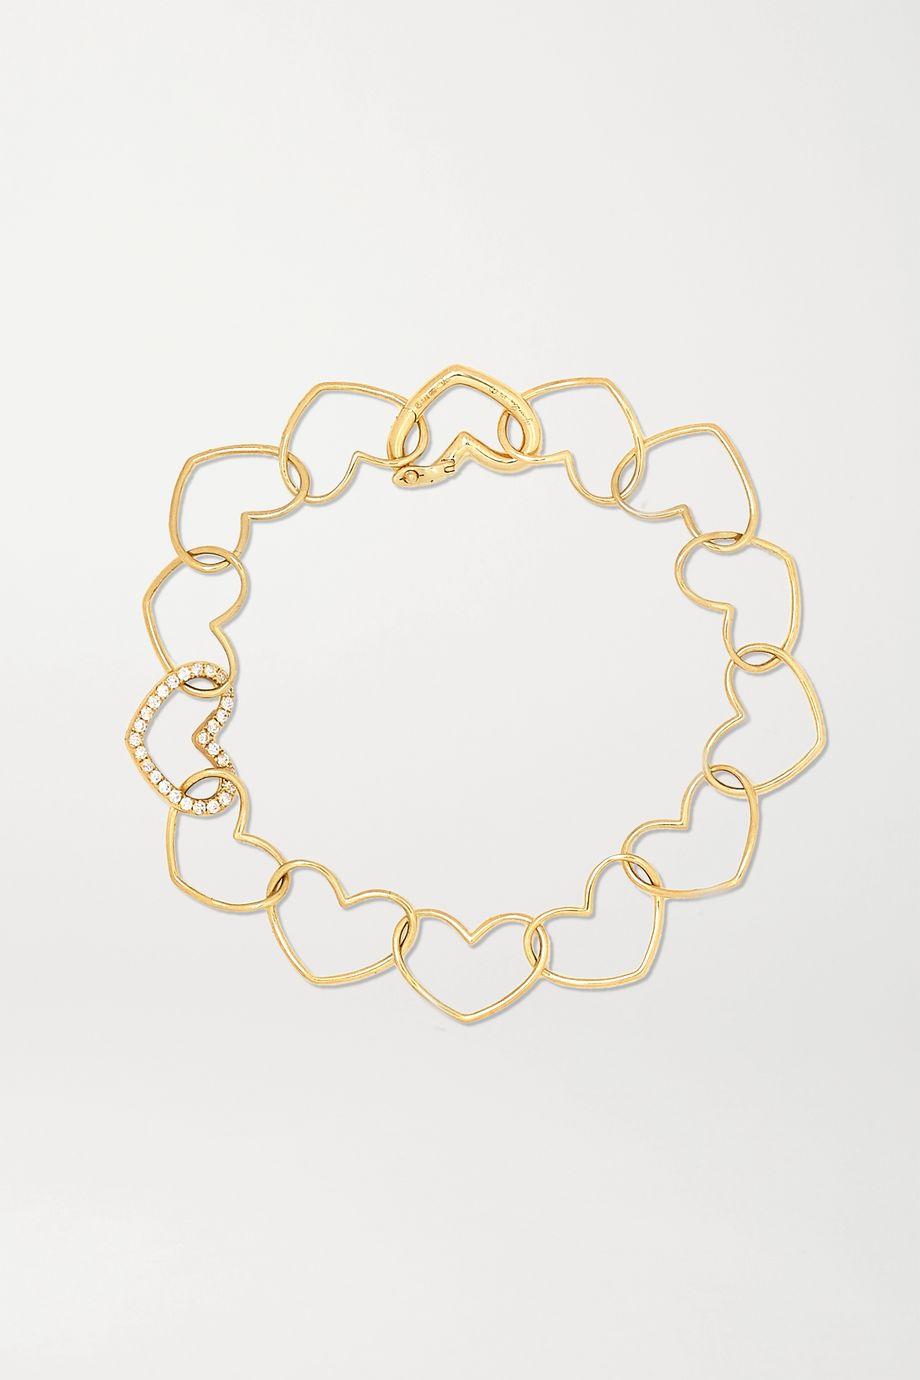 Yvonne Léon 9-karat gold diamond bracelet